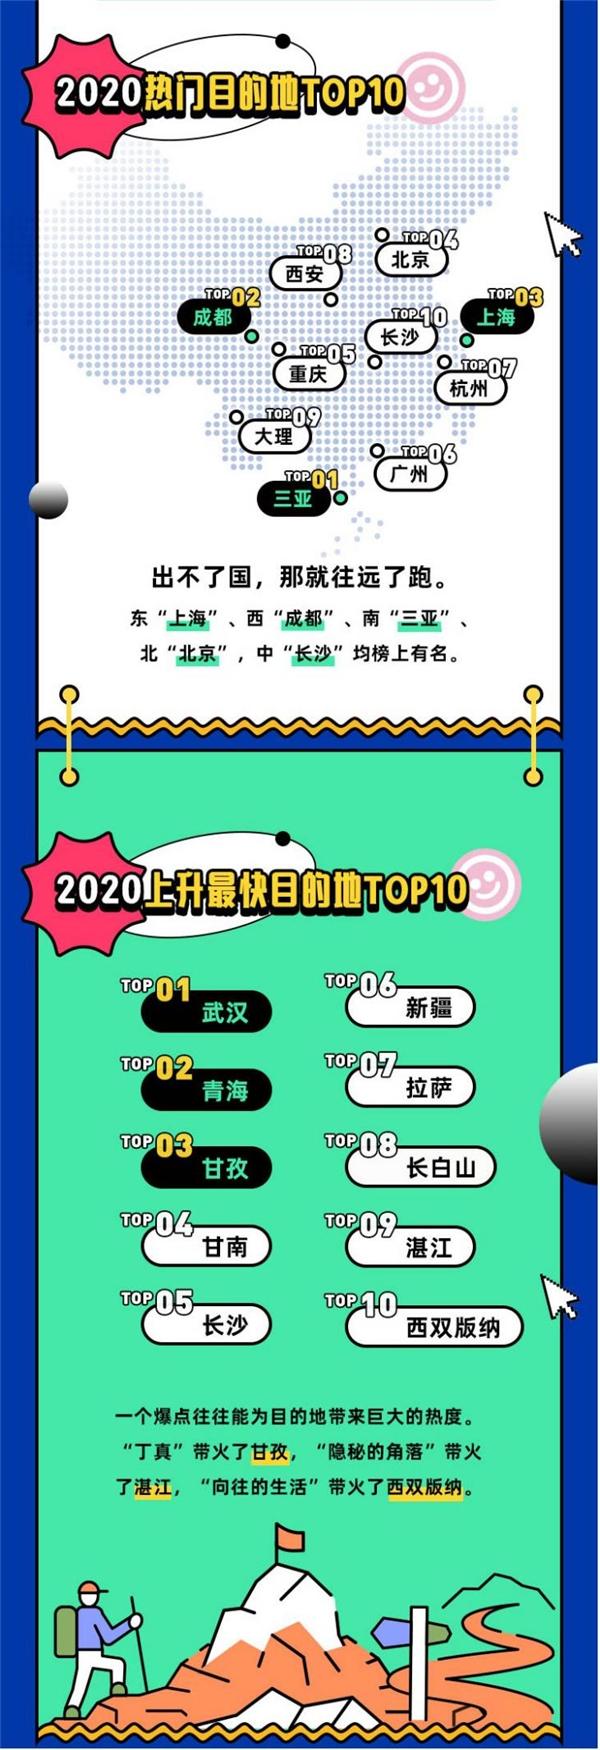 JNE Group《会玩的中国人》,出境游人群回归国内旅游变化大揭秘